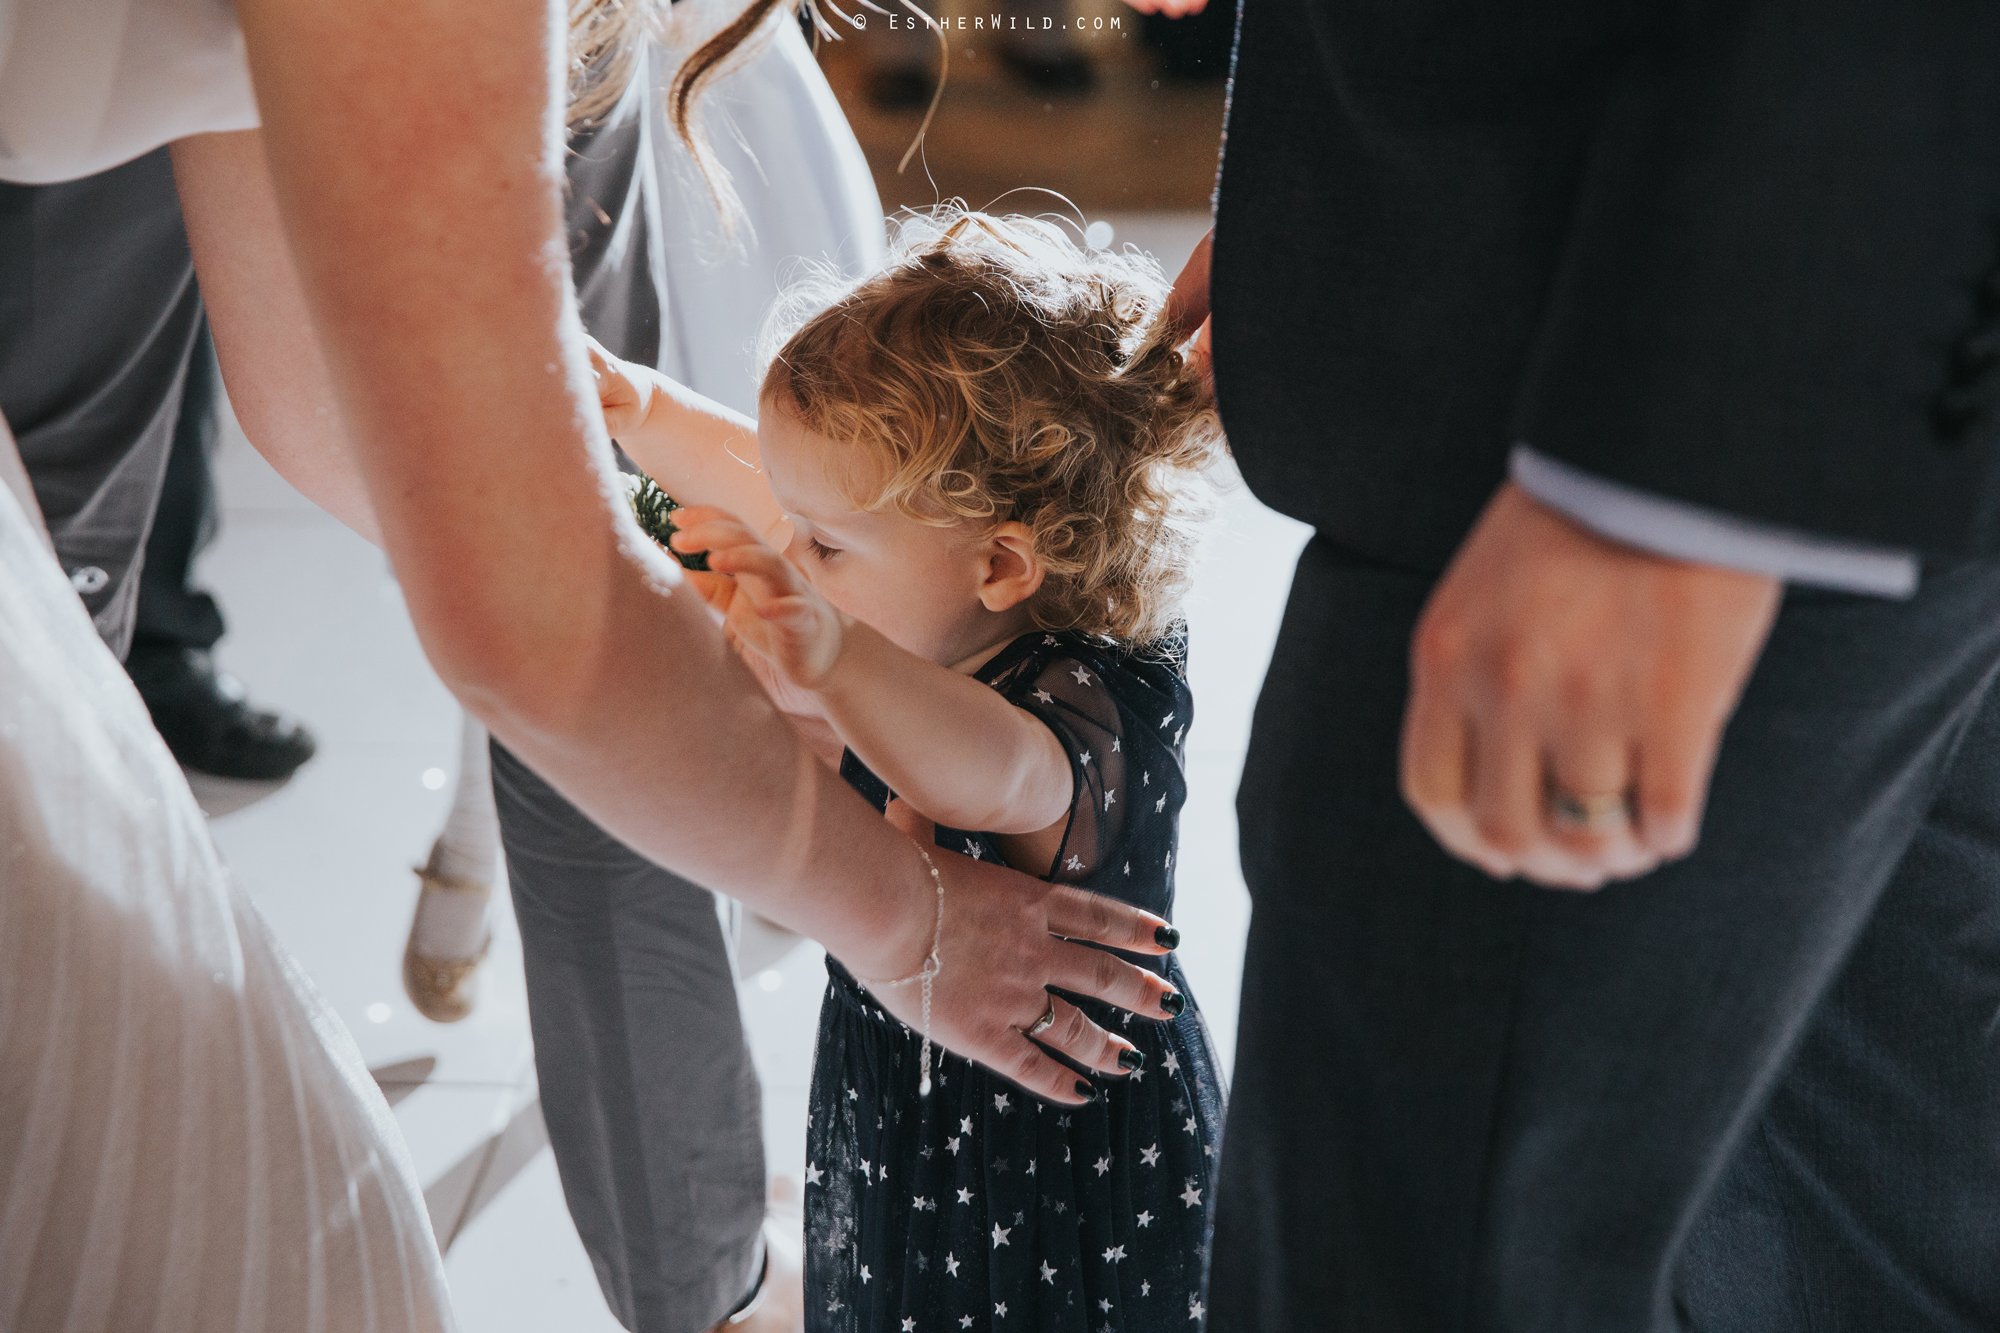 Elms_Barn_Weddings_Suffolk_Photographer_Copyright_Esther_Wild_IMG_3364.jpg